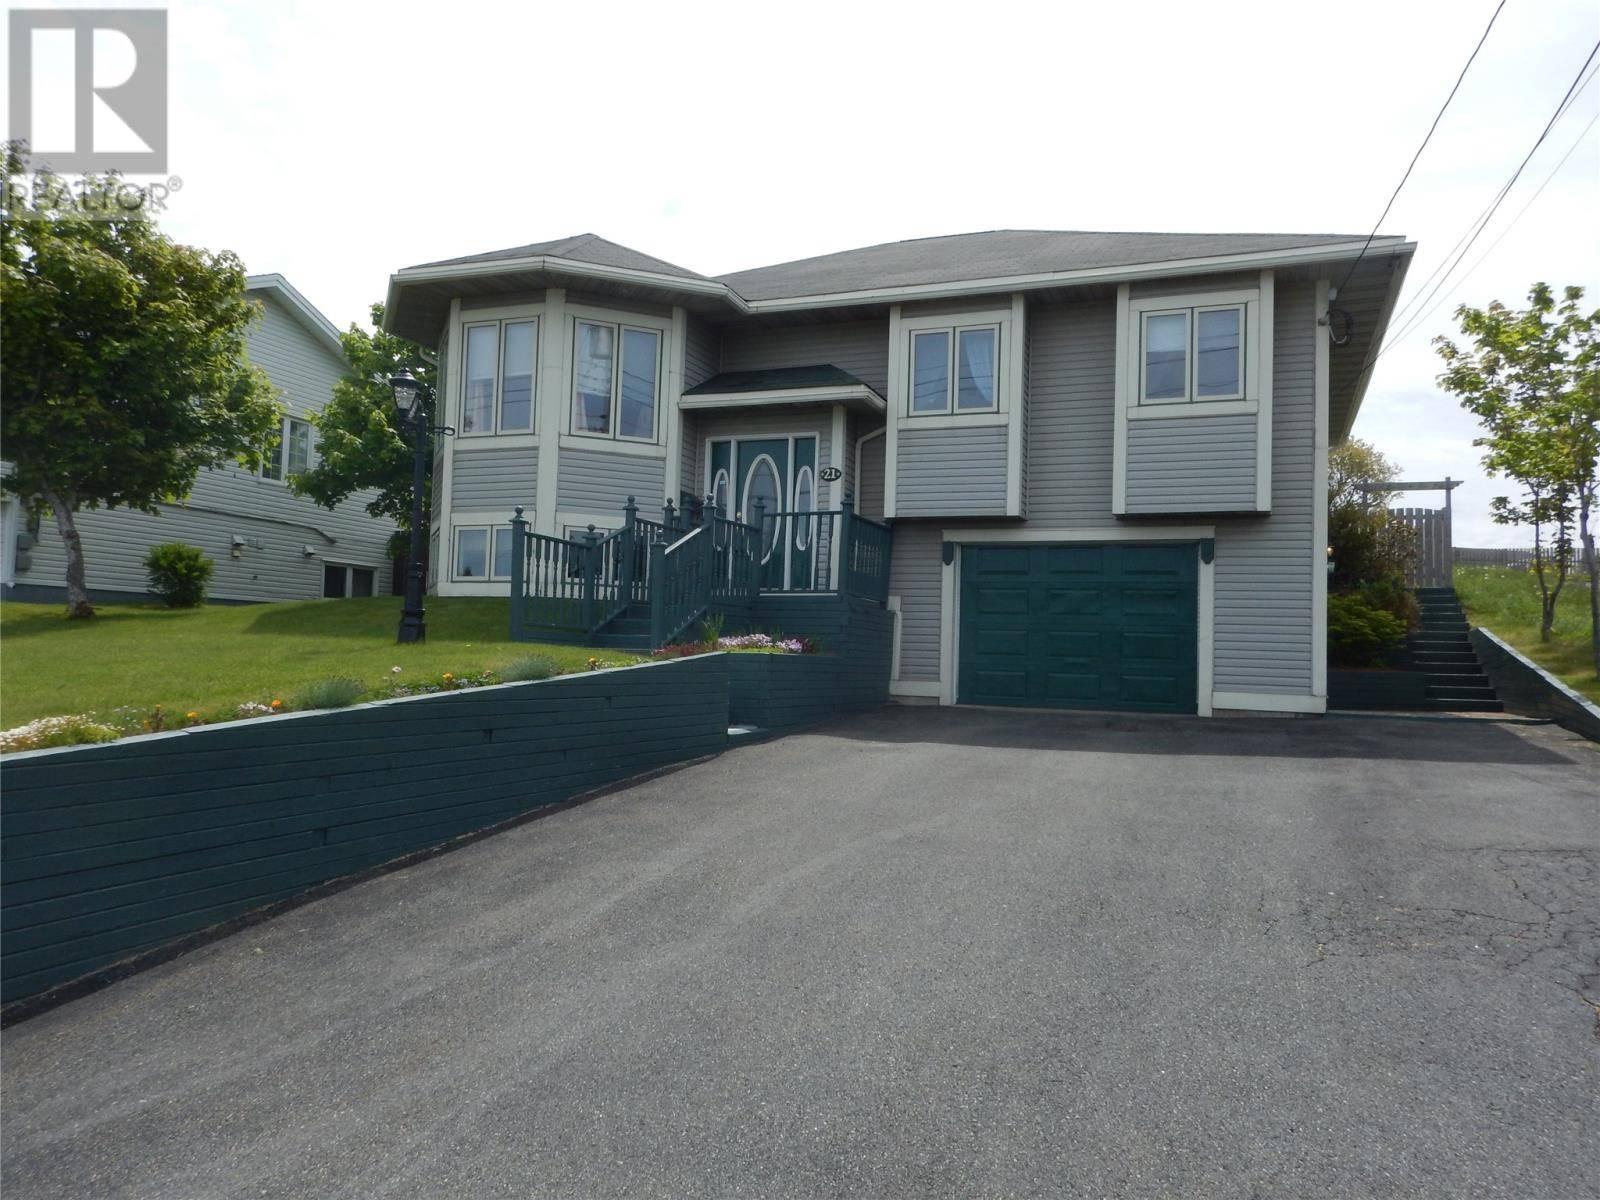 House for sale at 21 Old Bay Bulls Rd St. John's Newfoundland - MLS: 1207698